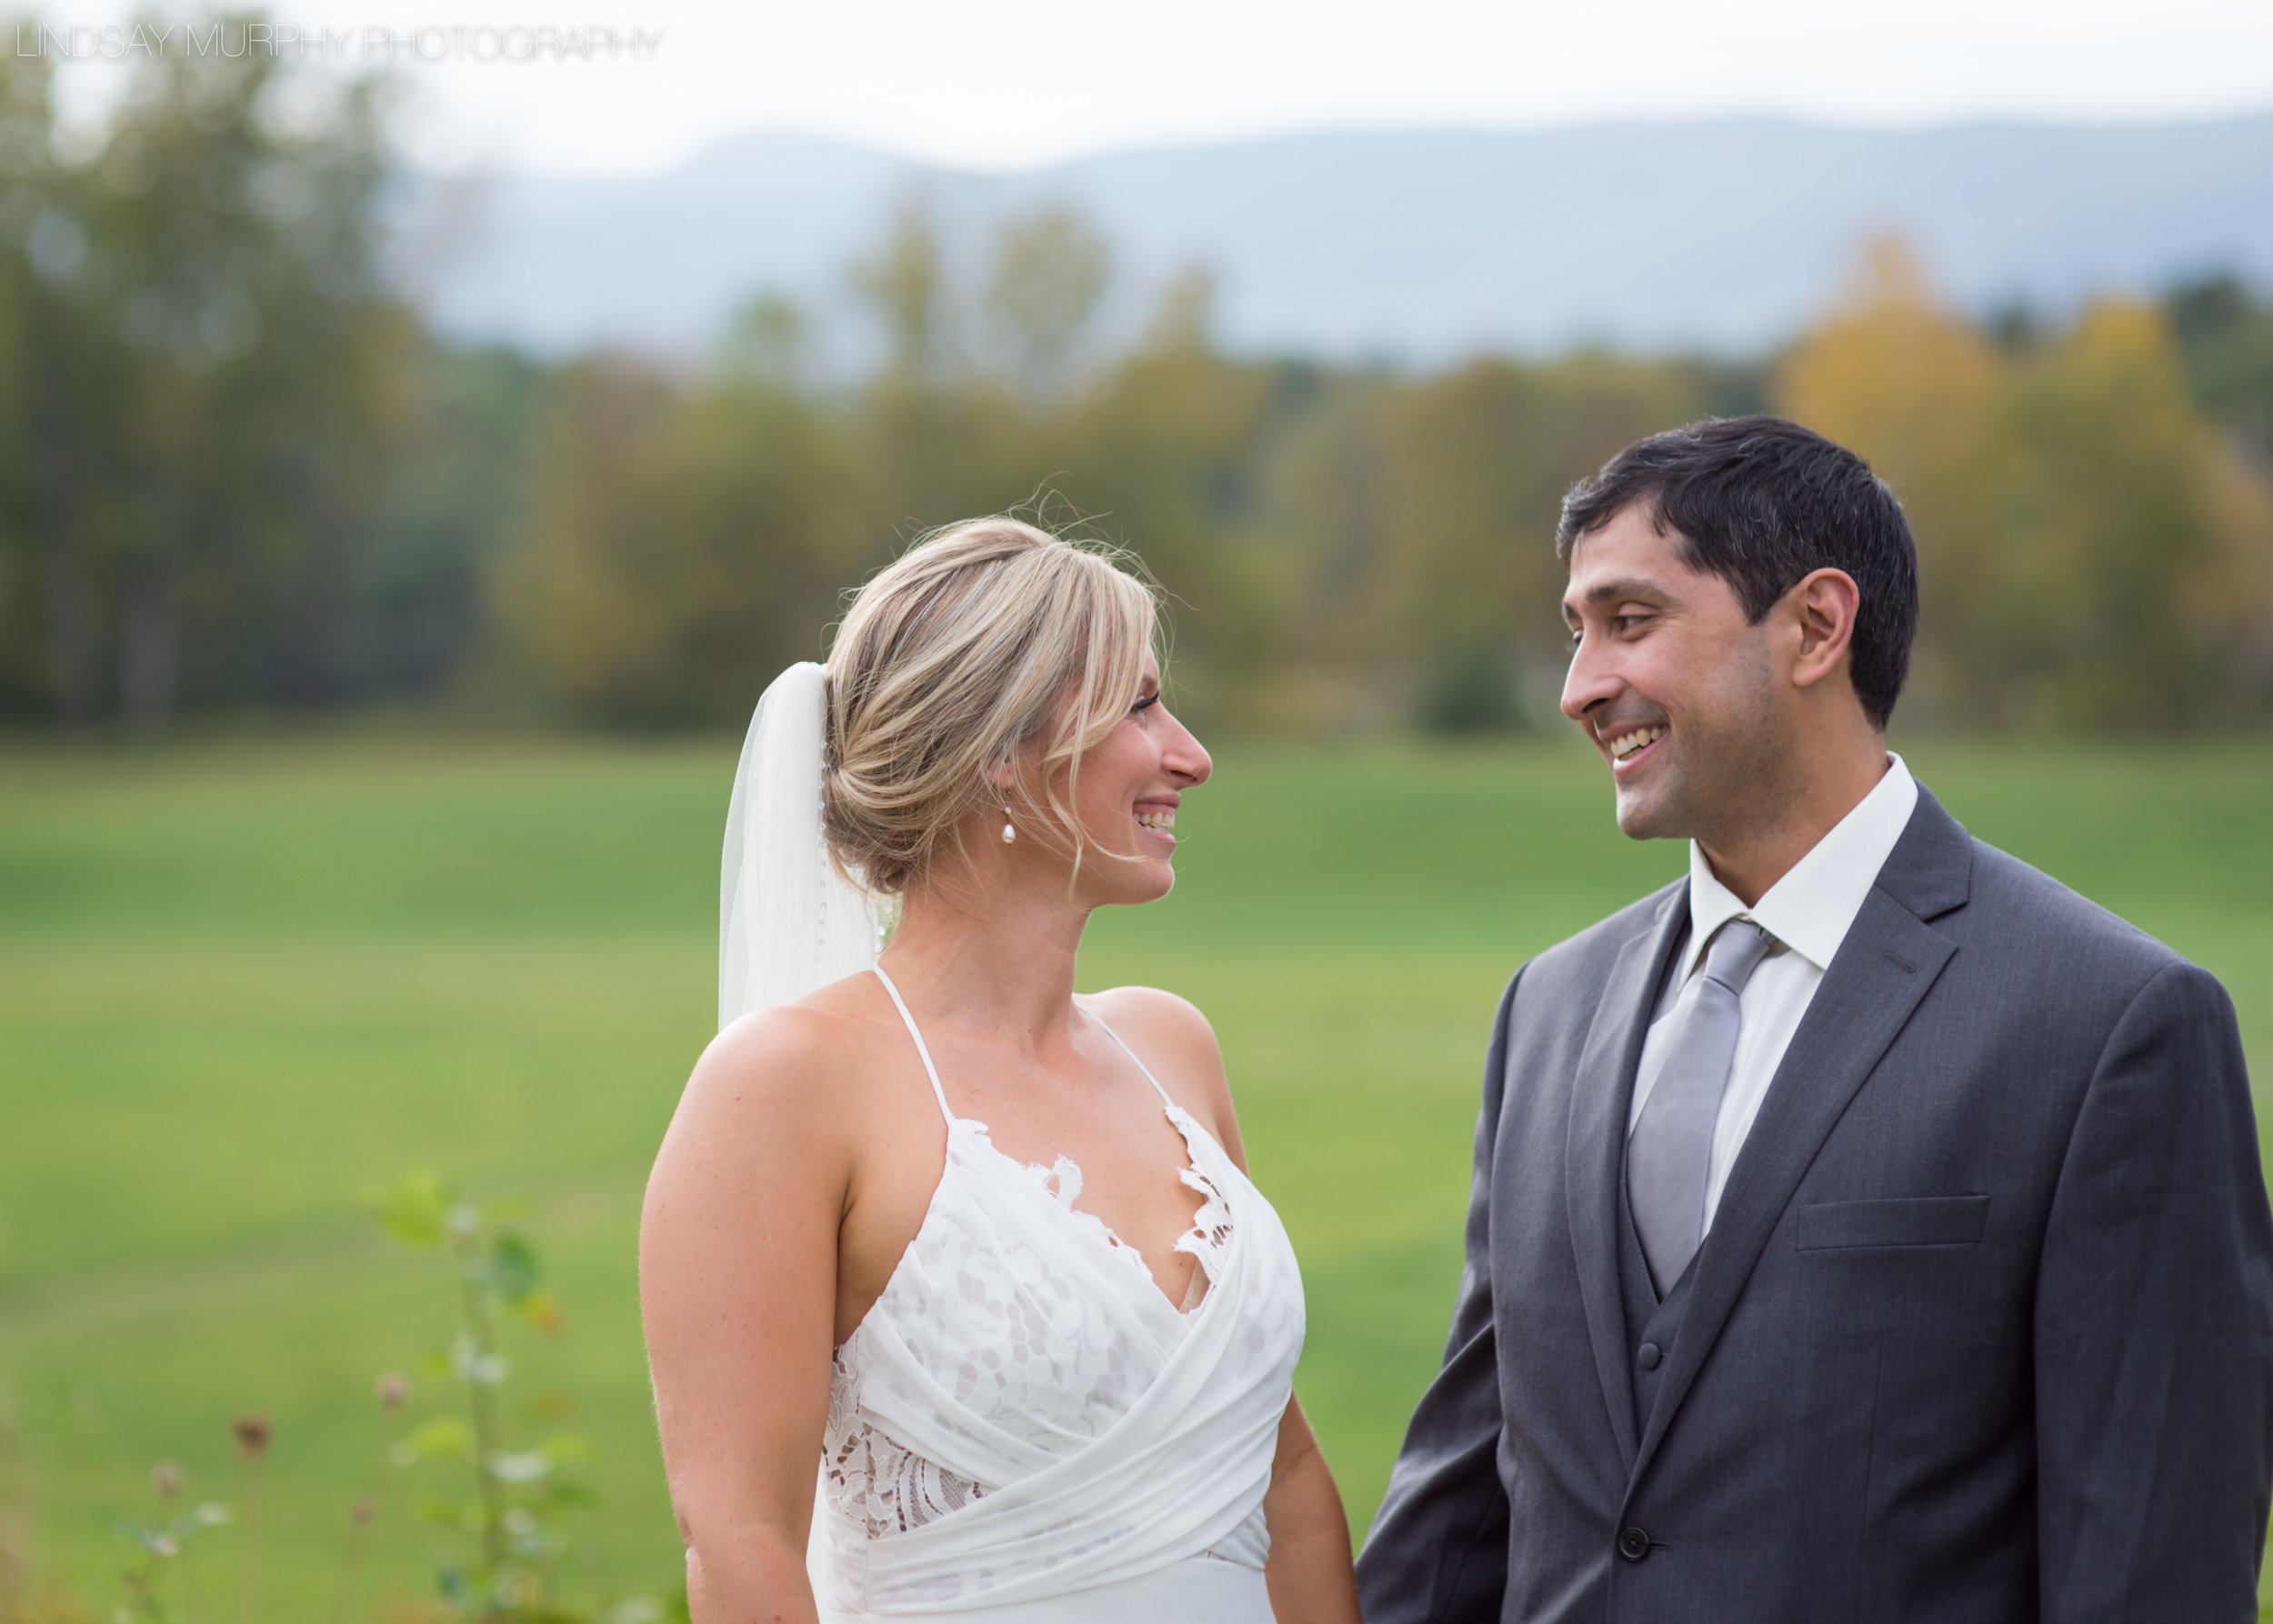 new_england_wedding-61.jpg